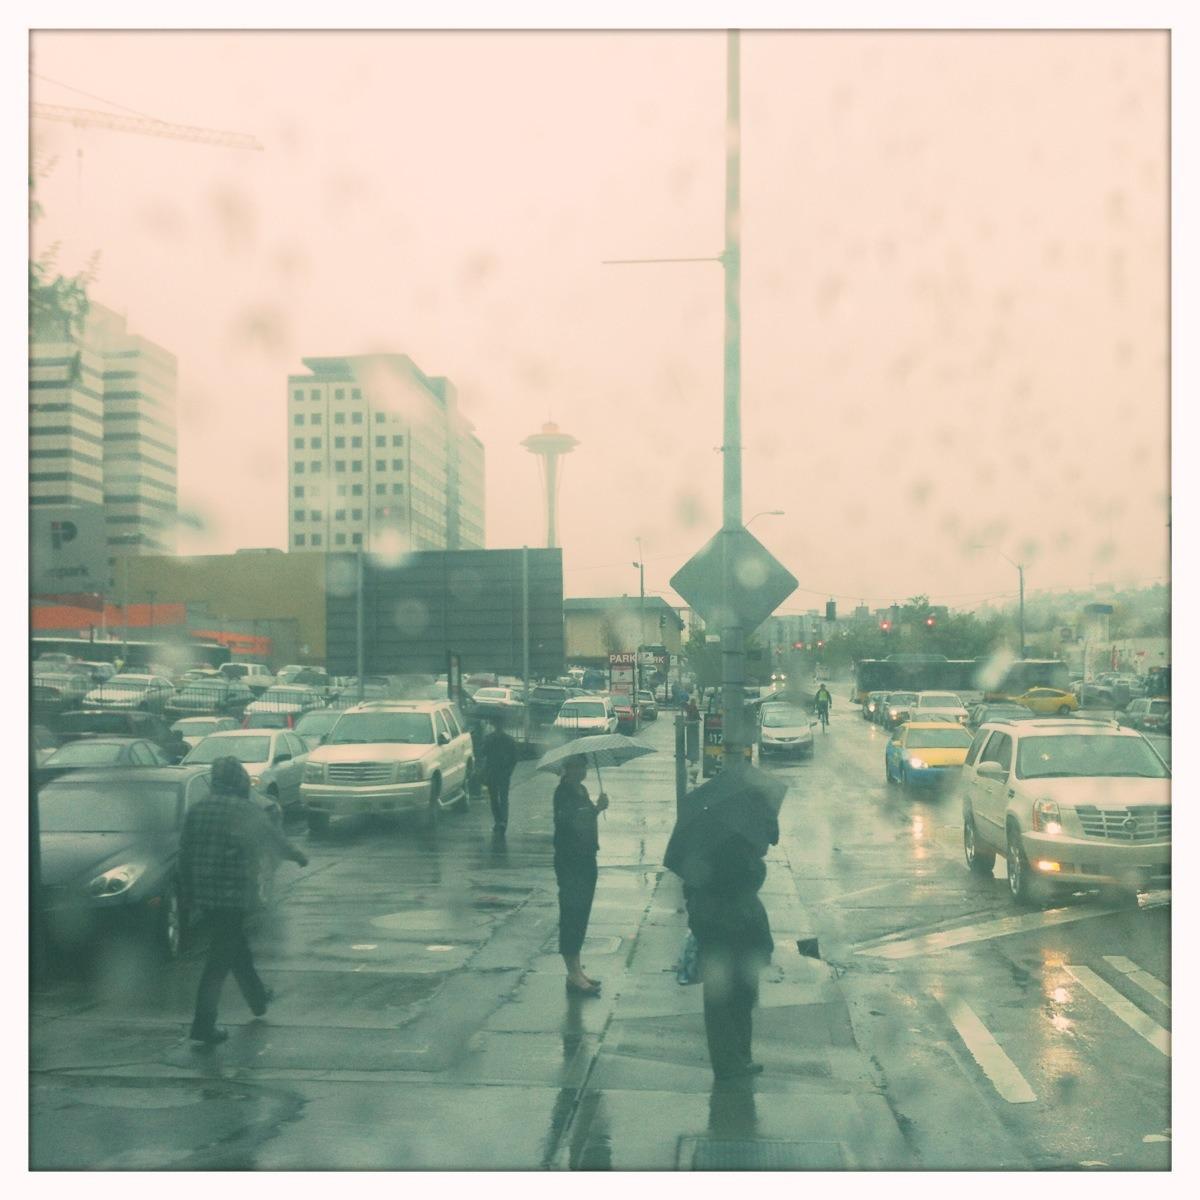 Orange Space Needle through a rain splashed window on the SLUT.   Adler 9009 Lens, Blanko Film, No Flash, Taken with  Hipstamatic